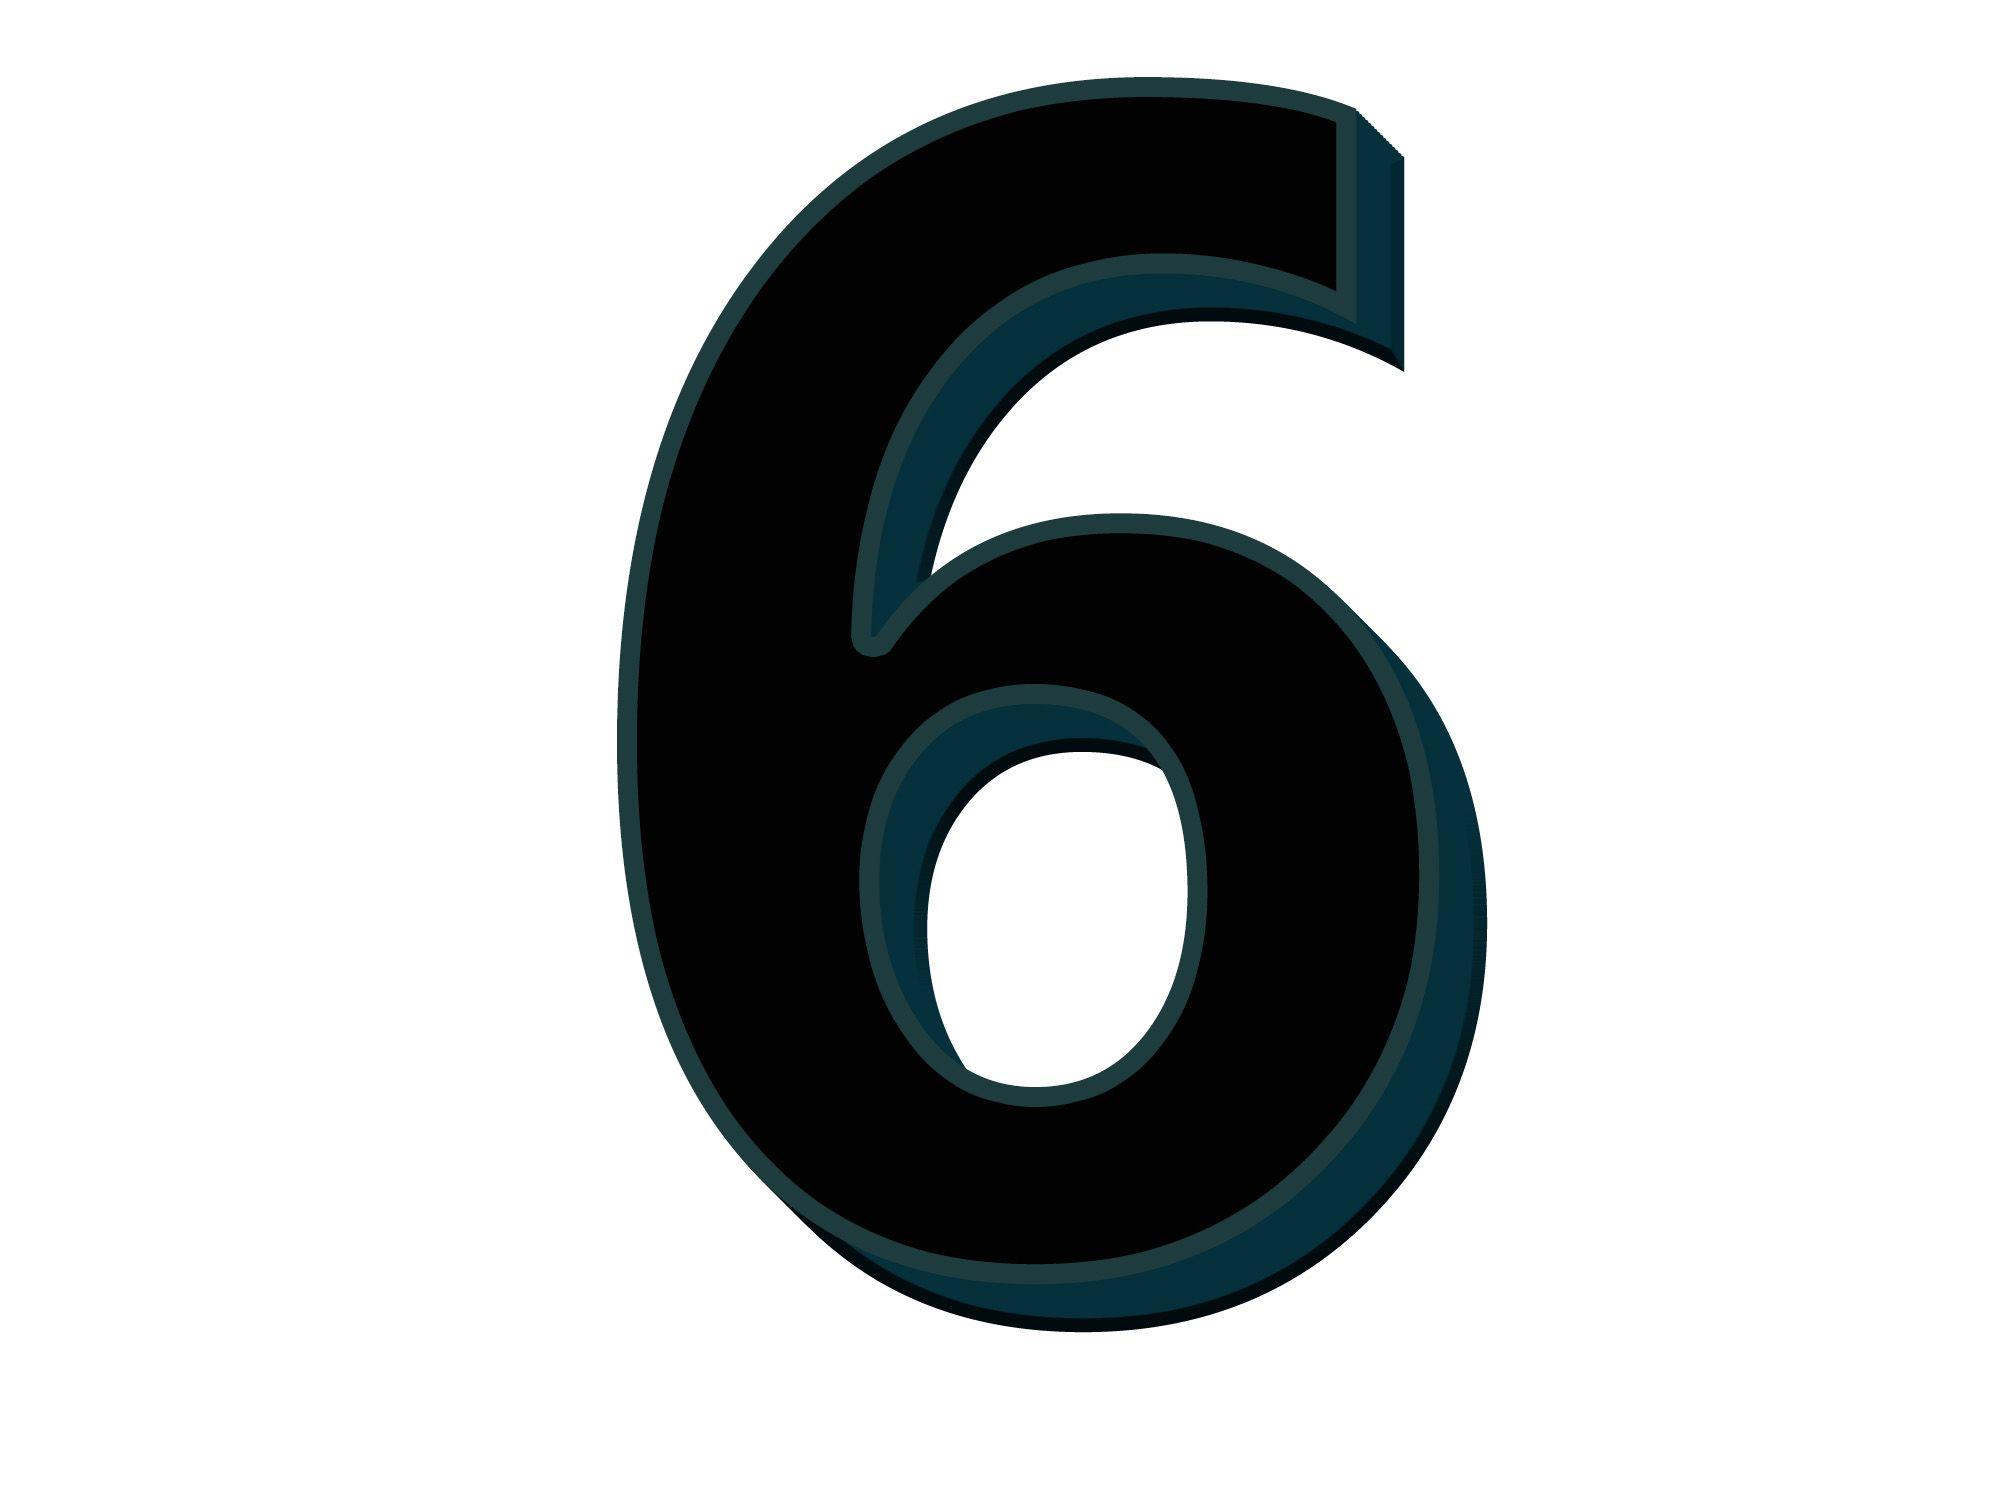 Radix Number 6